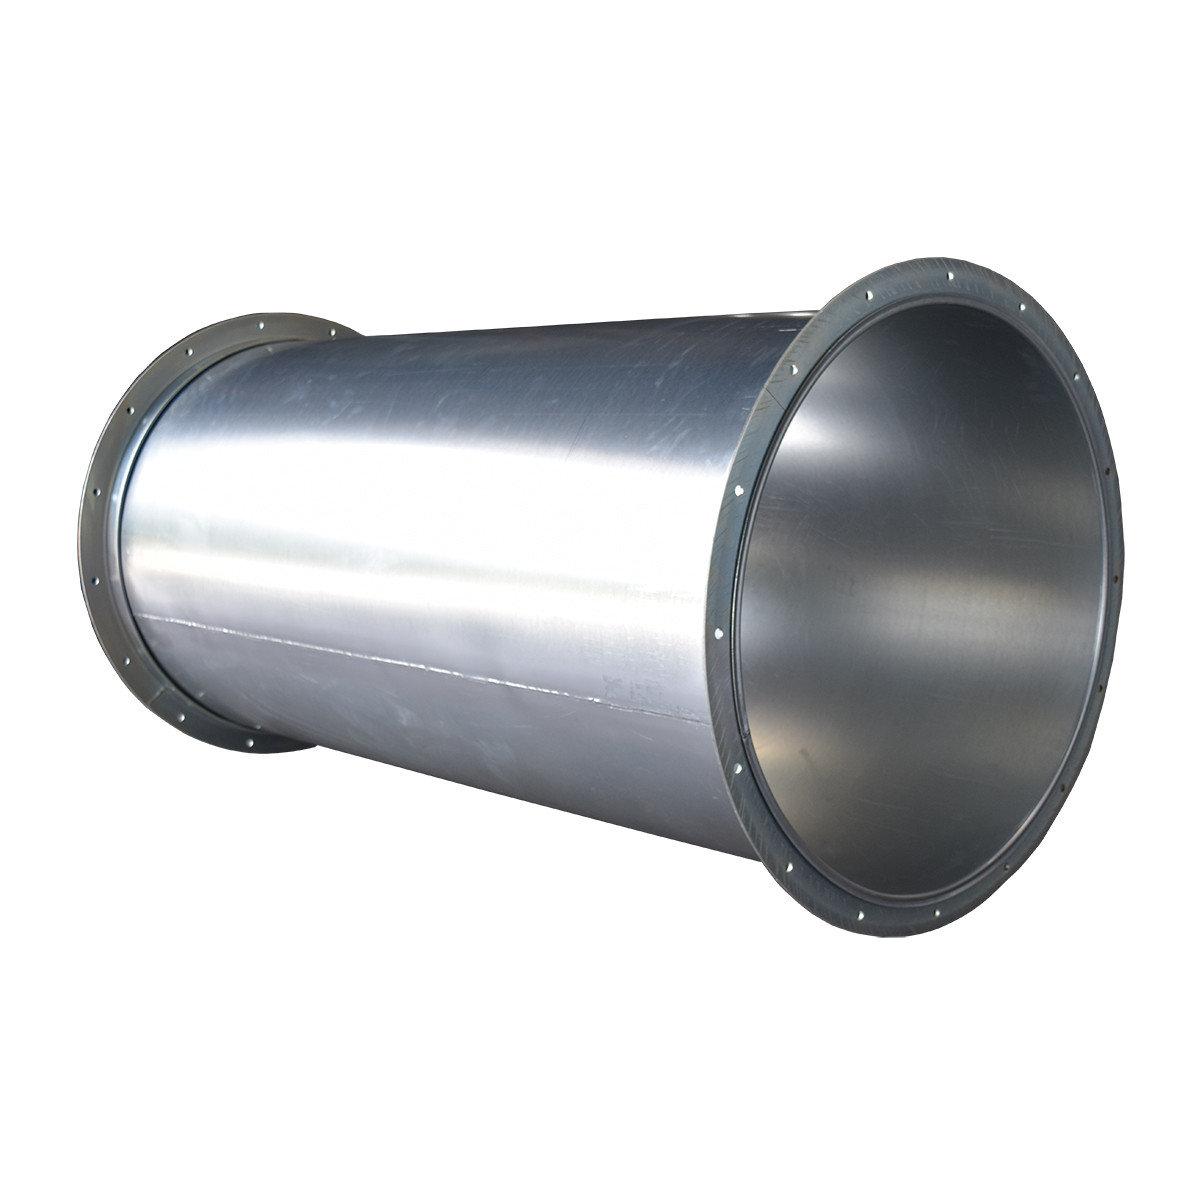 Flanged Pipe 16 Gauge